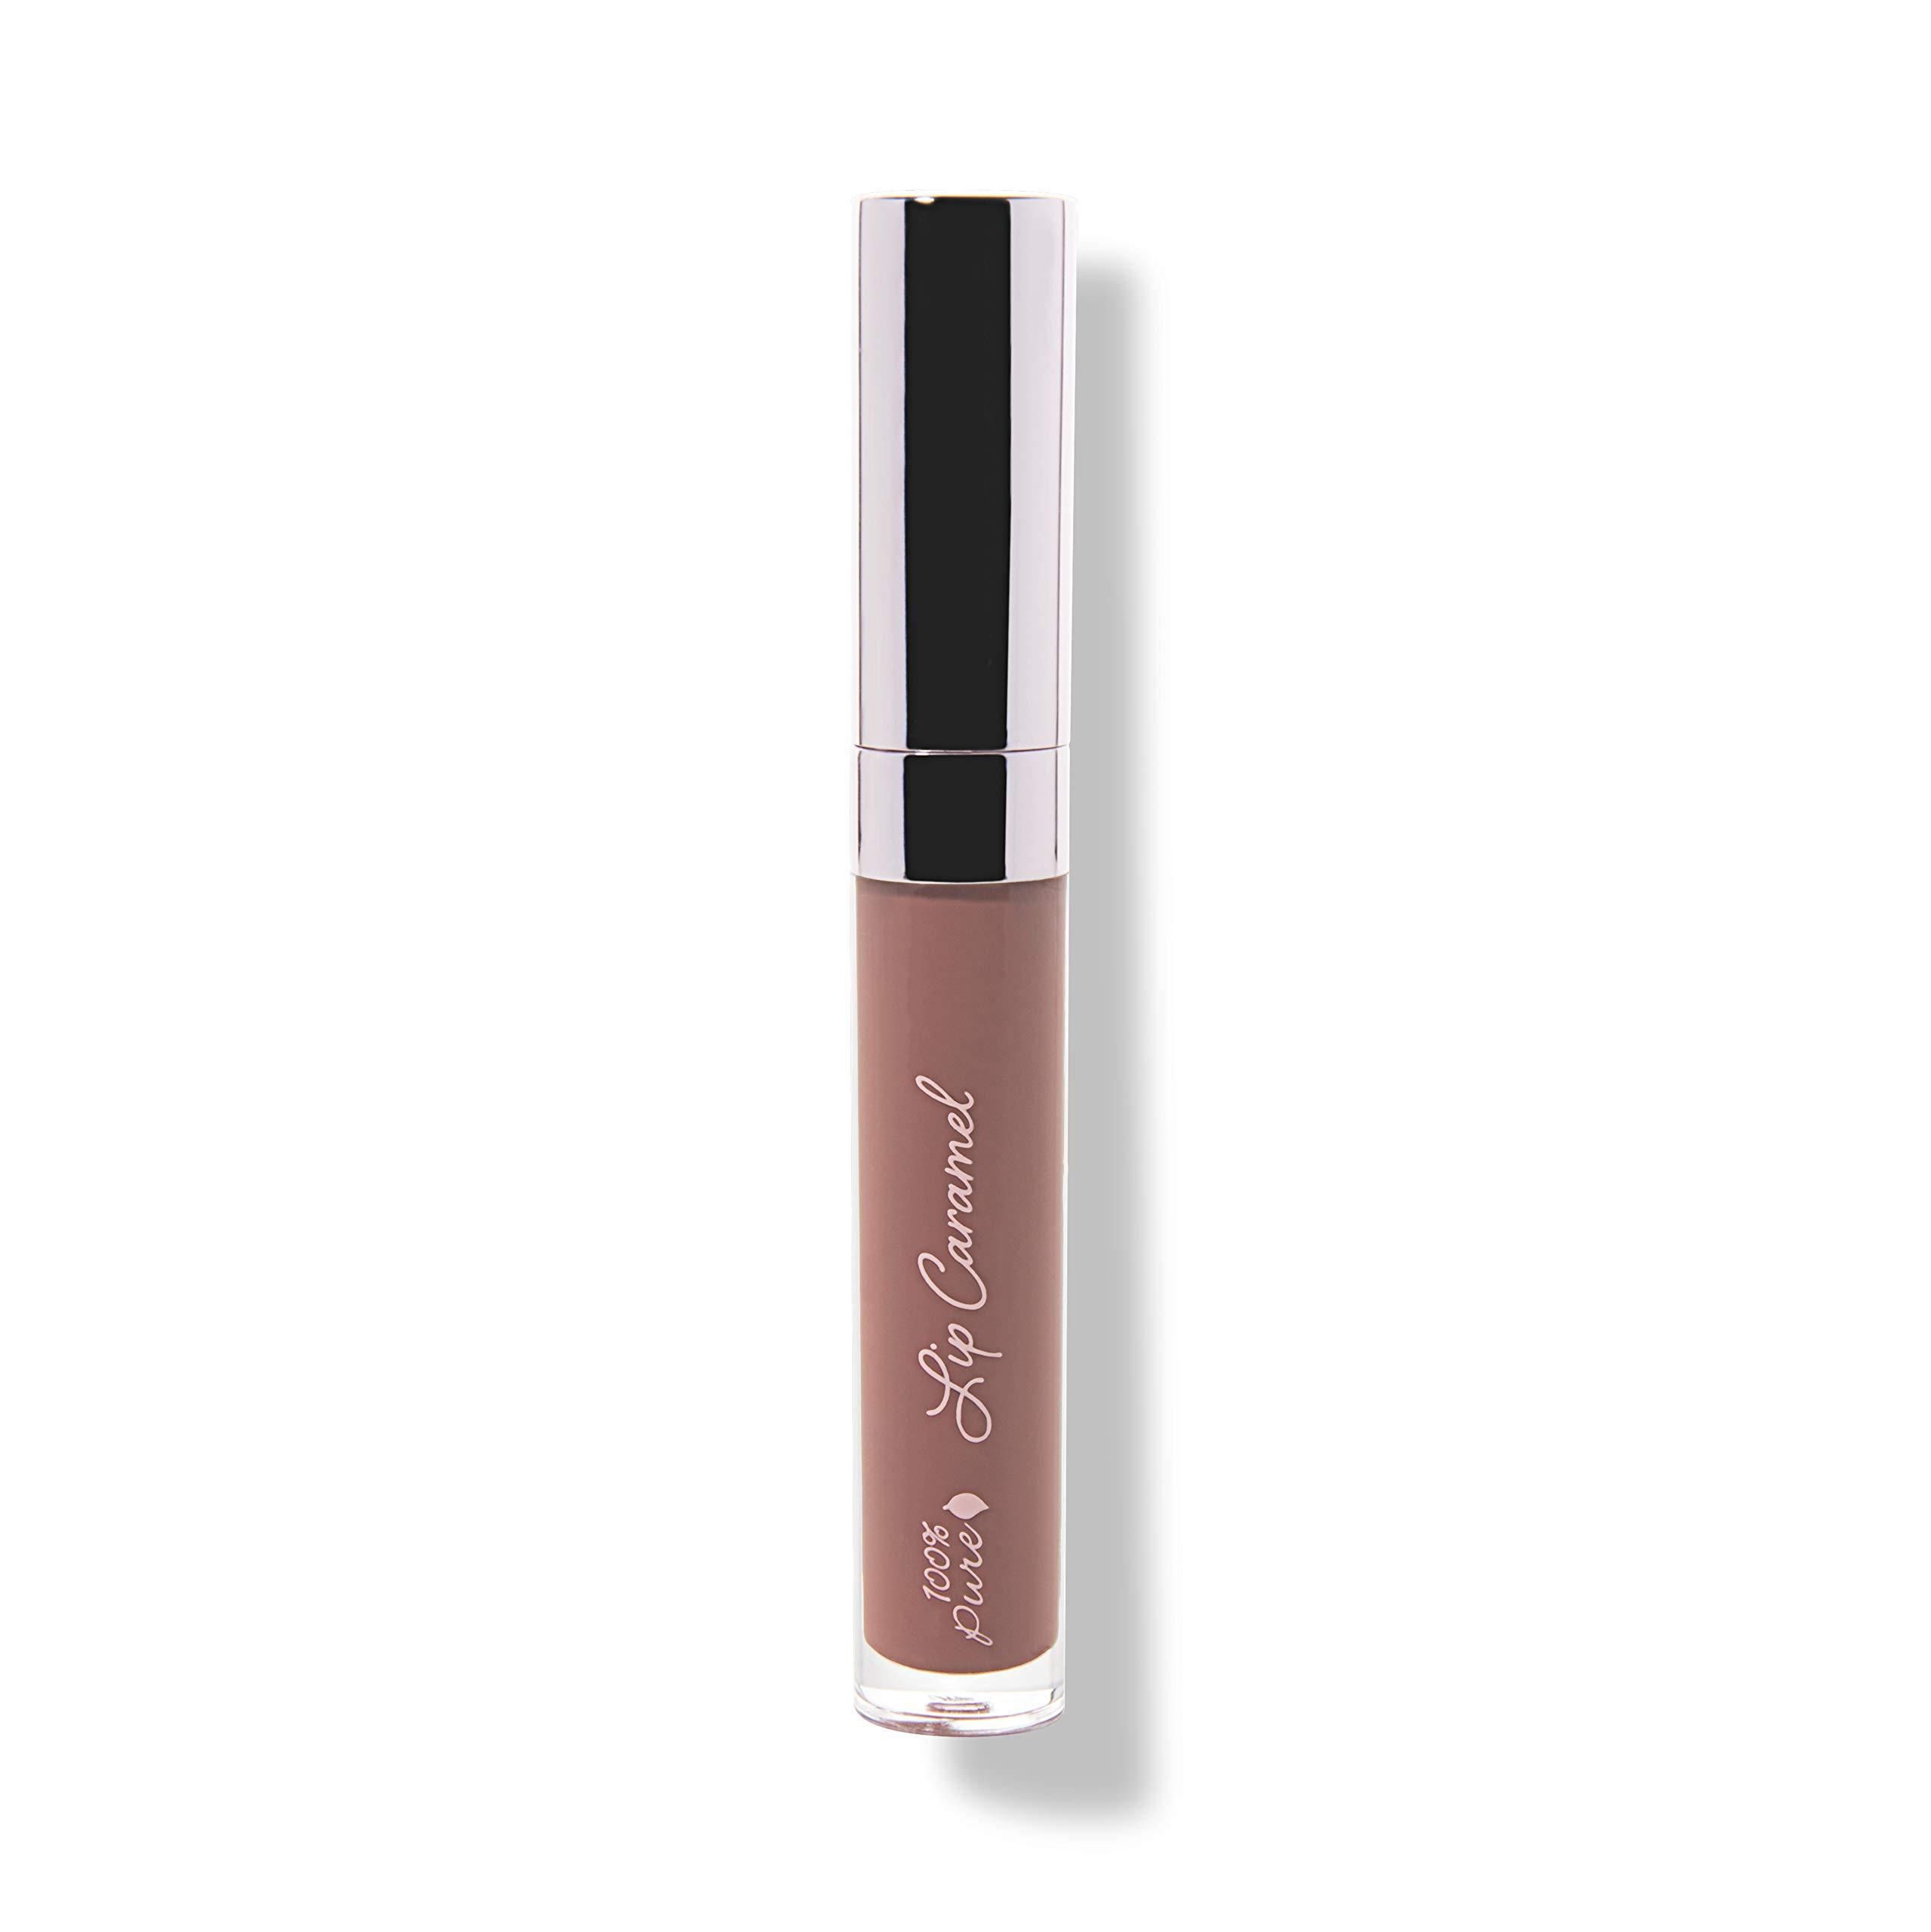 100% PURE Lip Caramel, Butterchew, Long Lasting Liquid Lipstick, Nude lipstick with Glossy Finish, Natural lipstick, Vegan Makeup (Pinky Brown Nude Color) - 0.177 Fl Oz